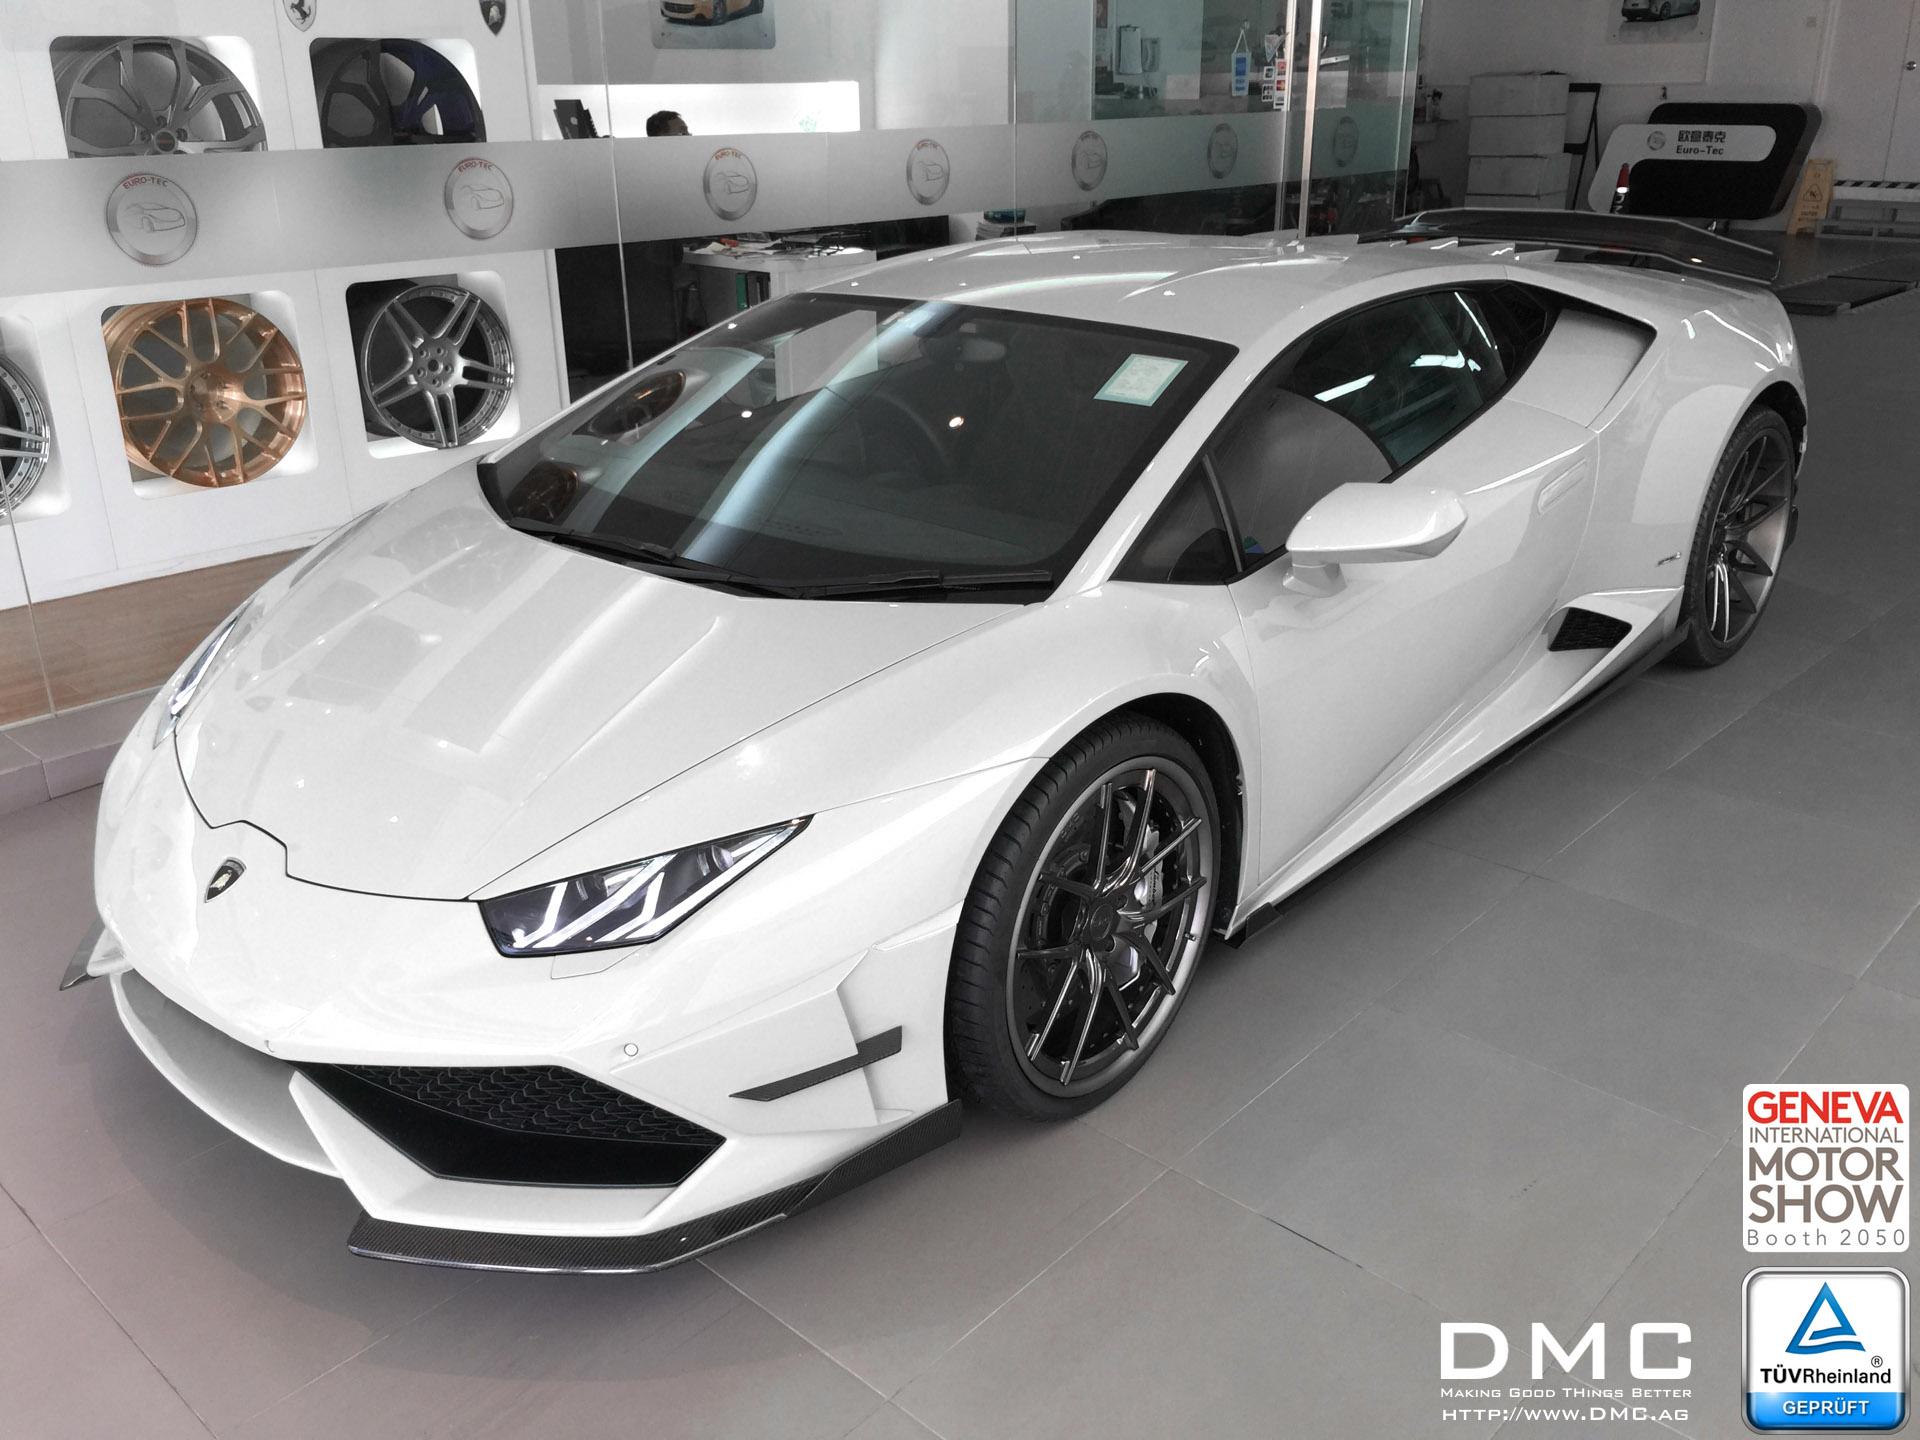 DMC Lamborghini Huracan is Already TUV-approved